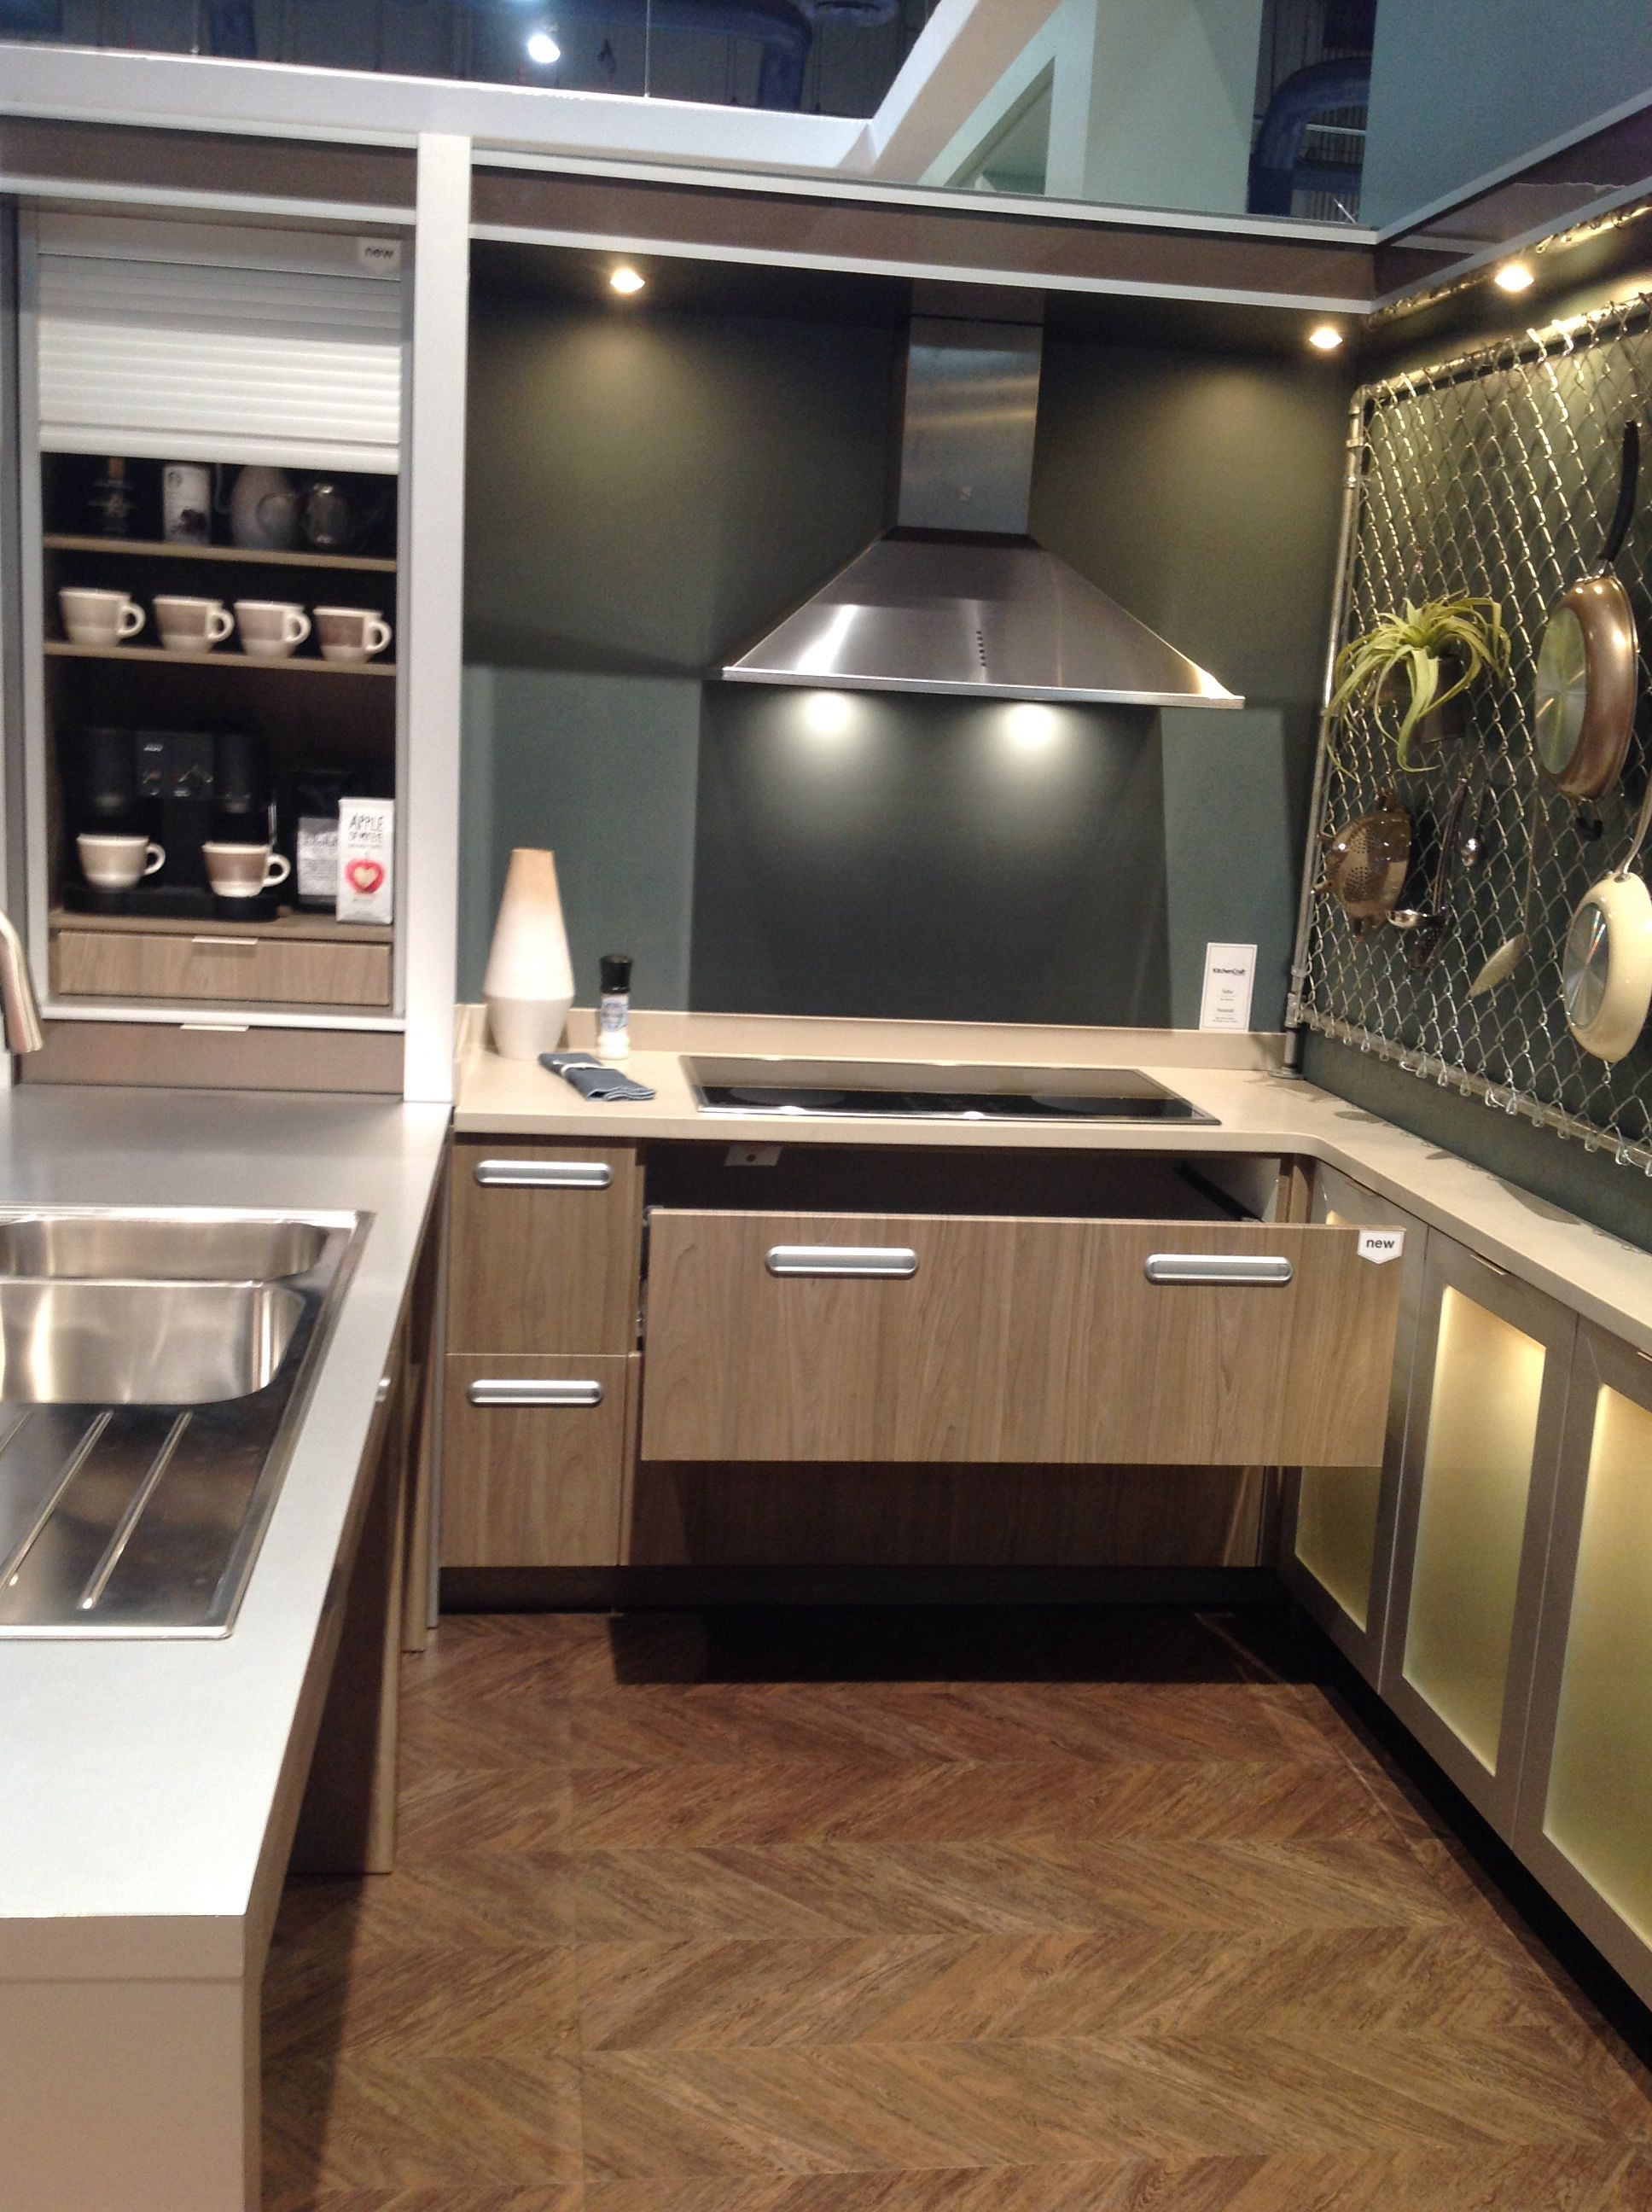 Mastercraft Kitchen Cabinet Display Kbis Las Vegas 2015 Kitchen Room Display Cabinet Kitchen Cabinets